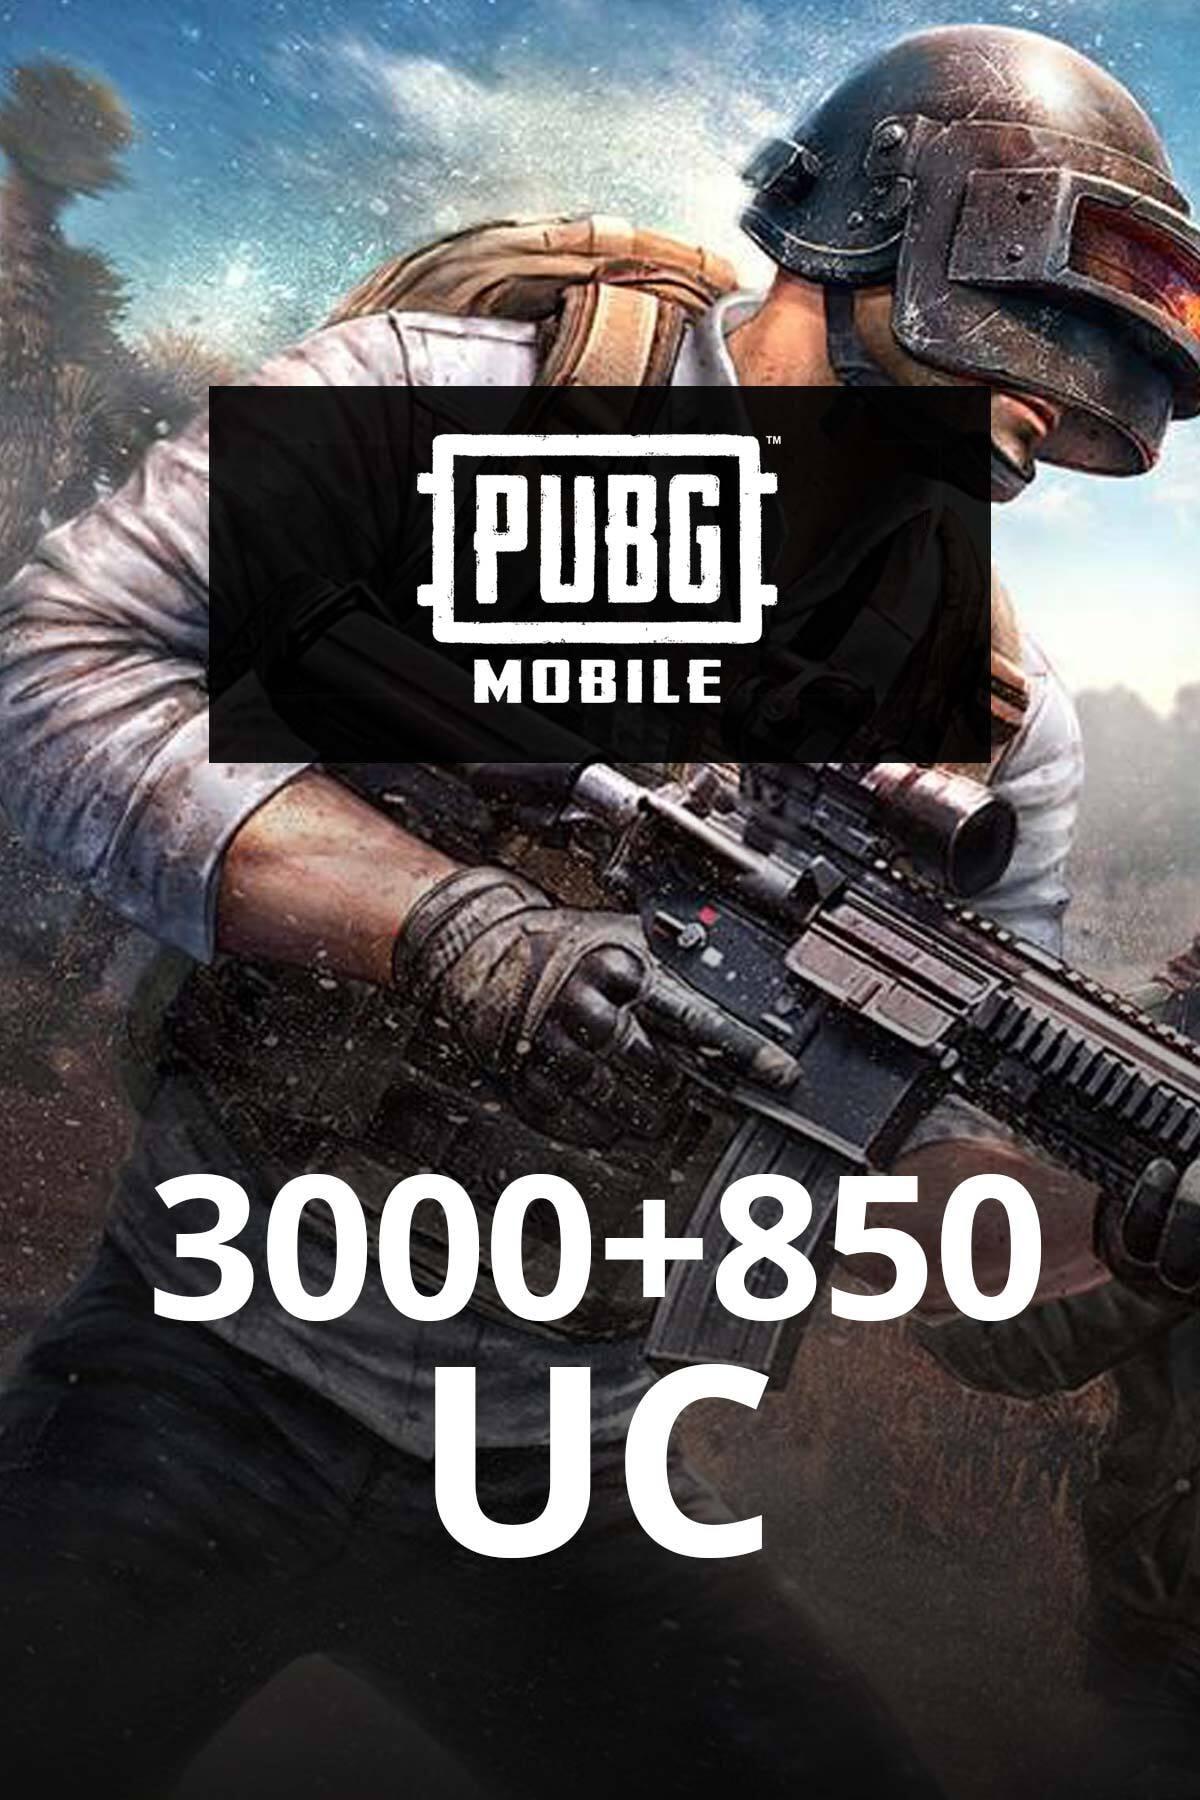 Mobile 3000 + 850 UC